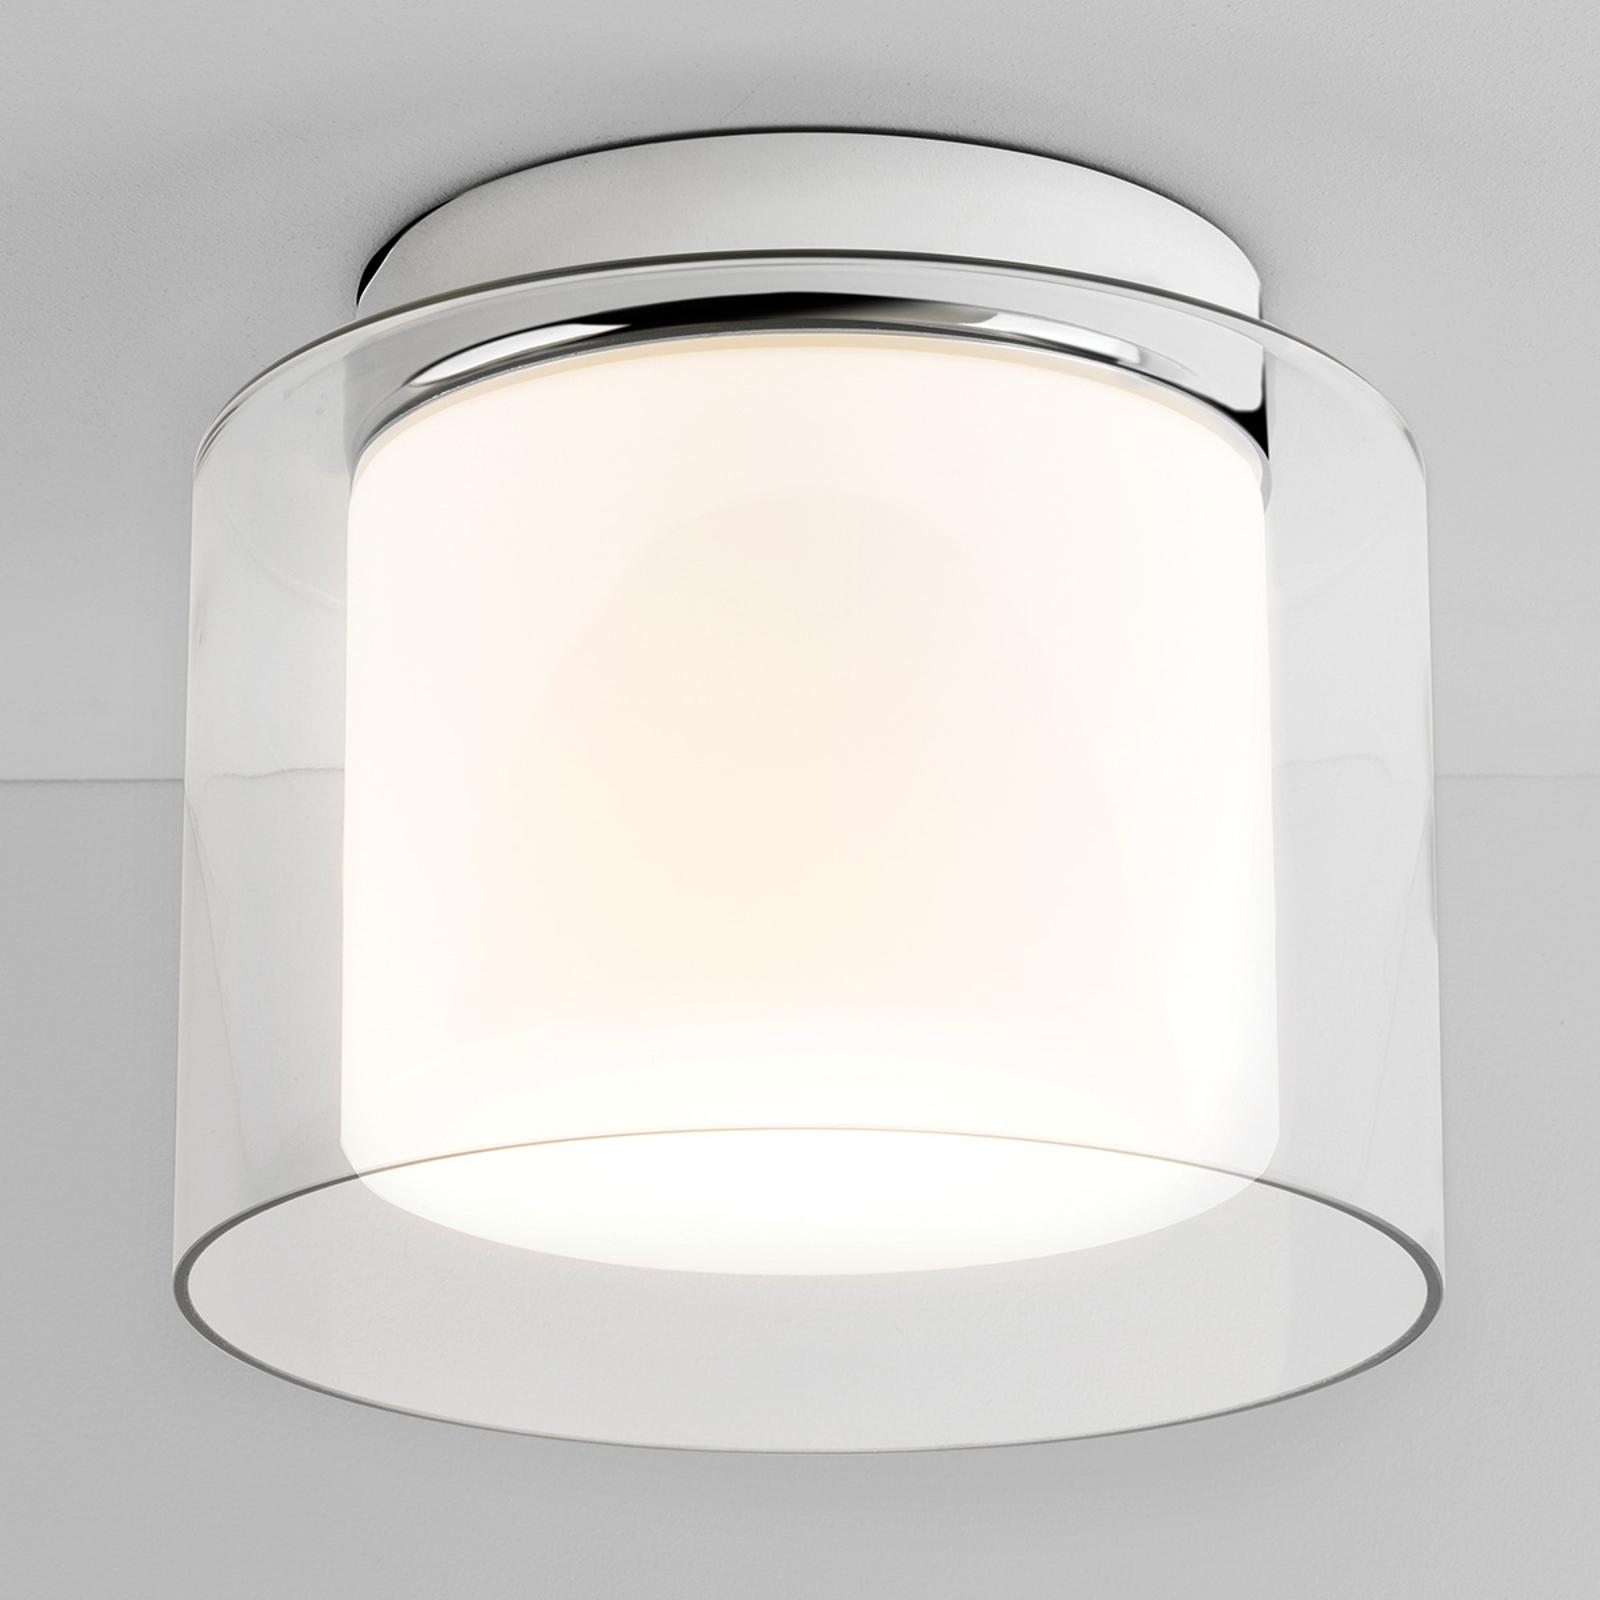 Lámpara de techo AREZZO de doble vidrio